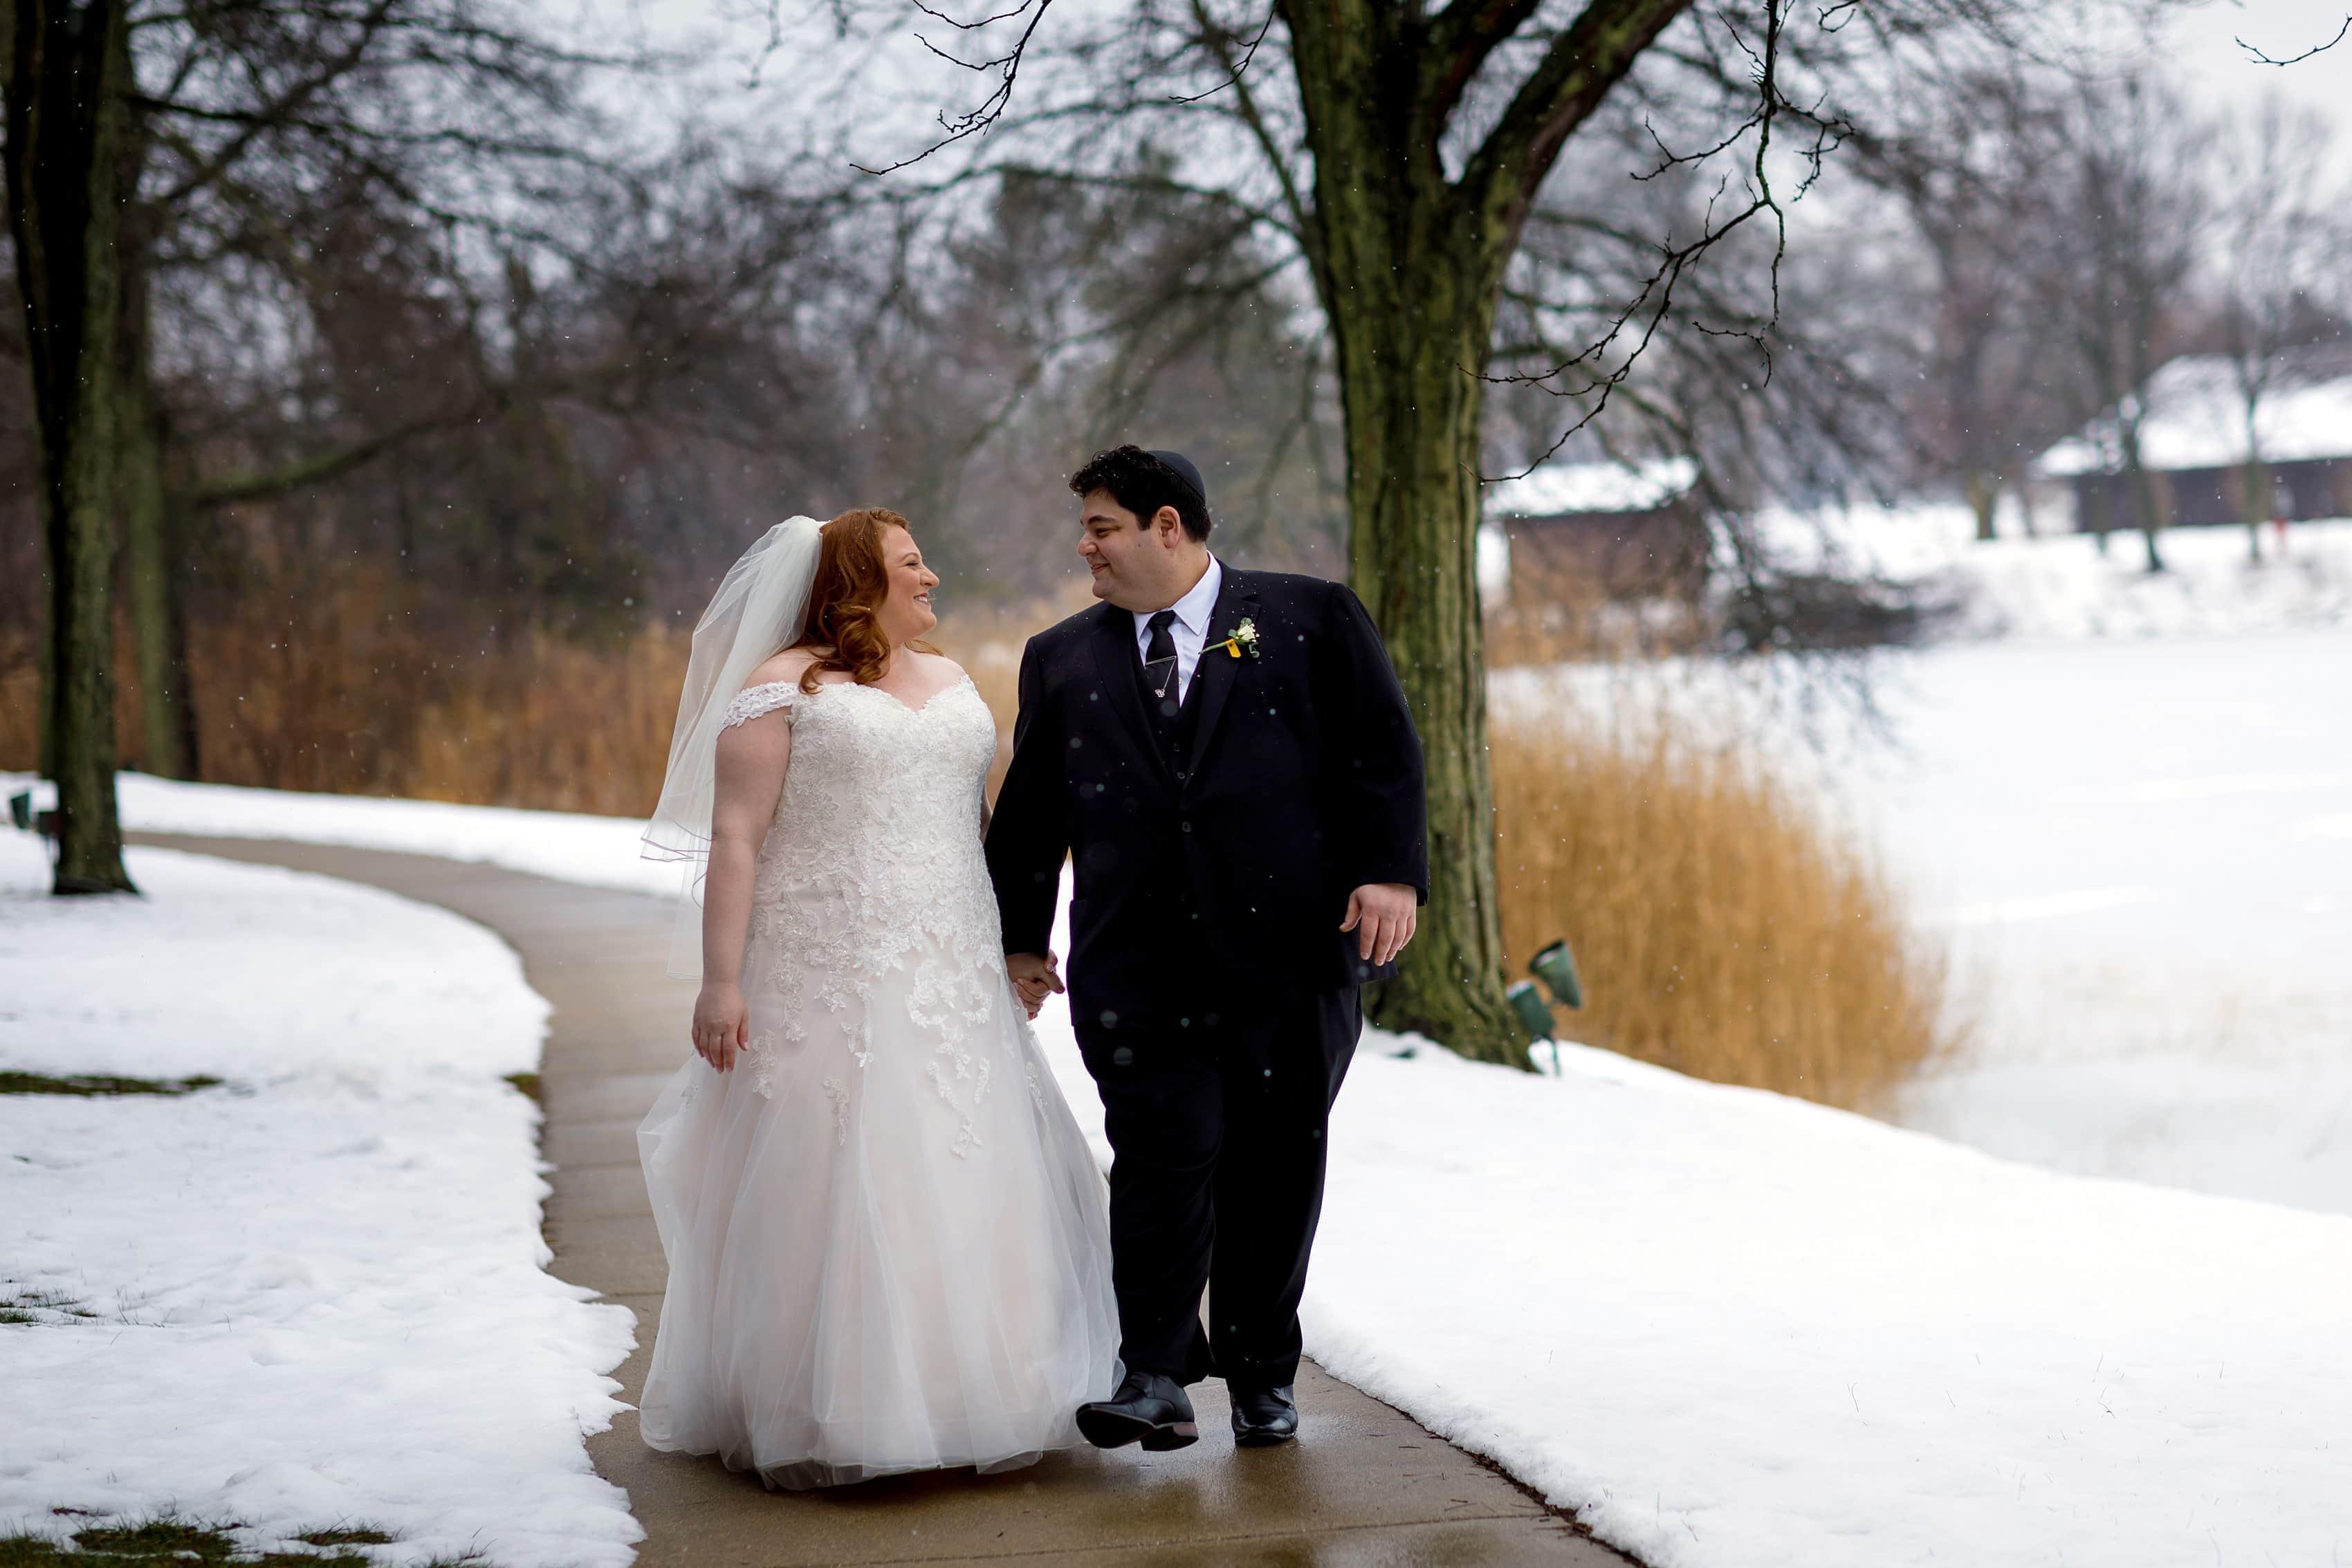 Winter Wedding at Lincolnshire Marriott Resort: Erin & Michael